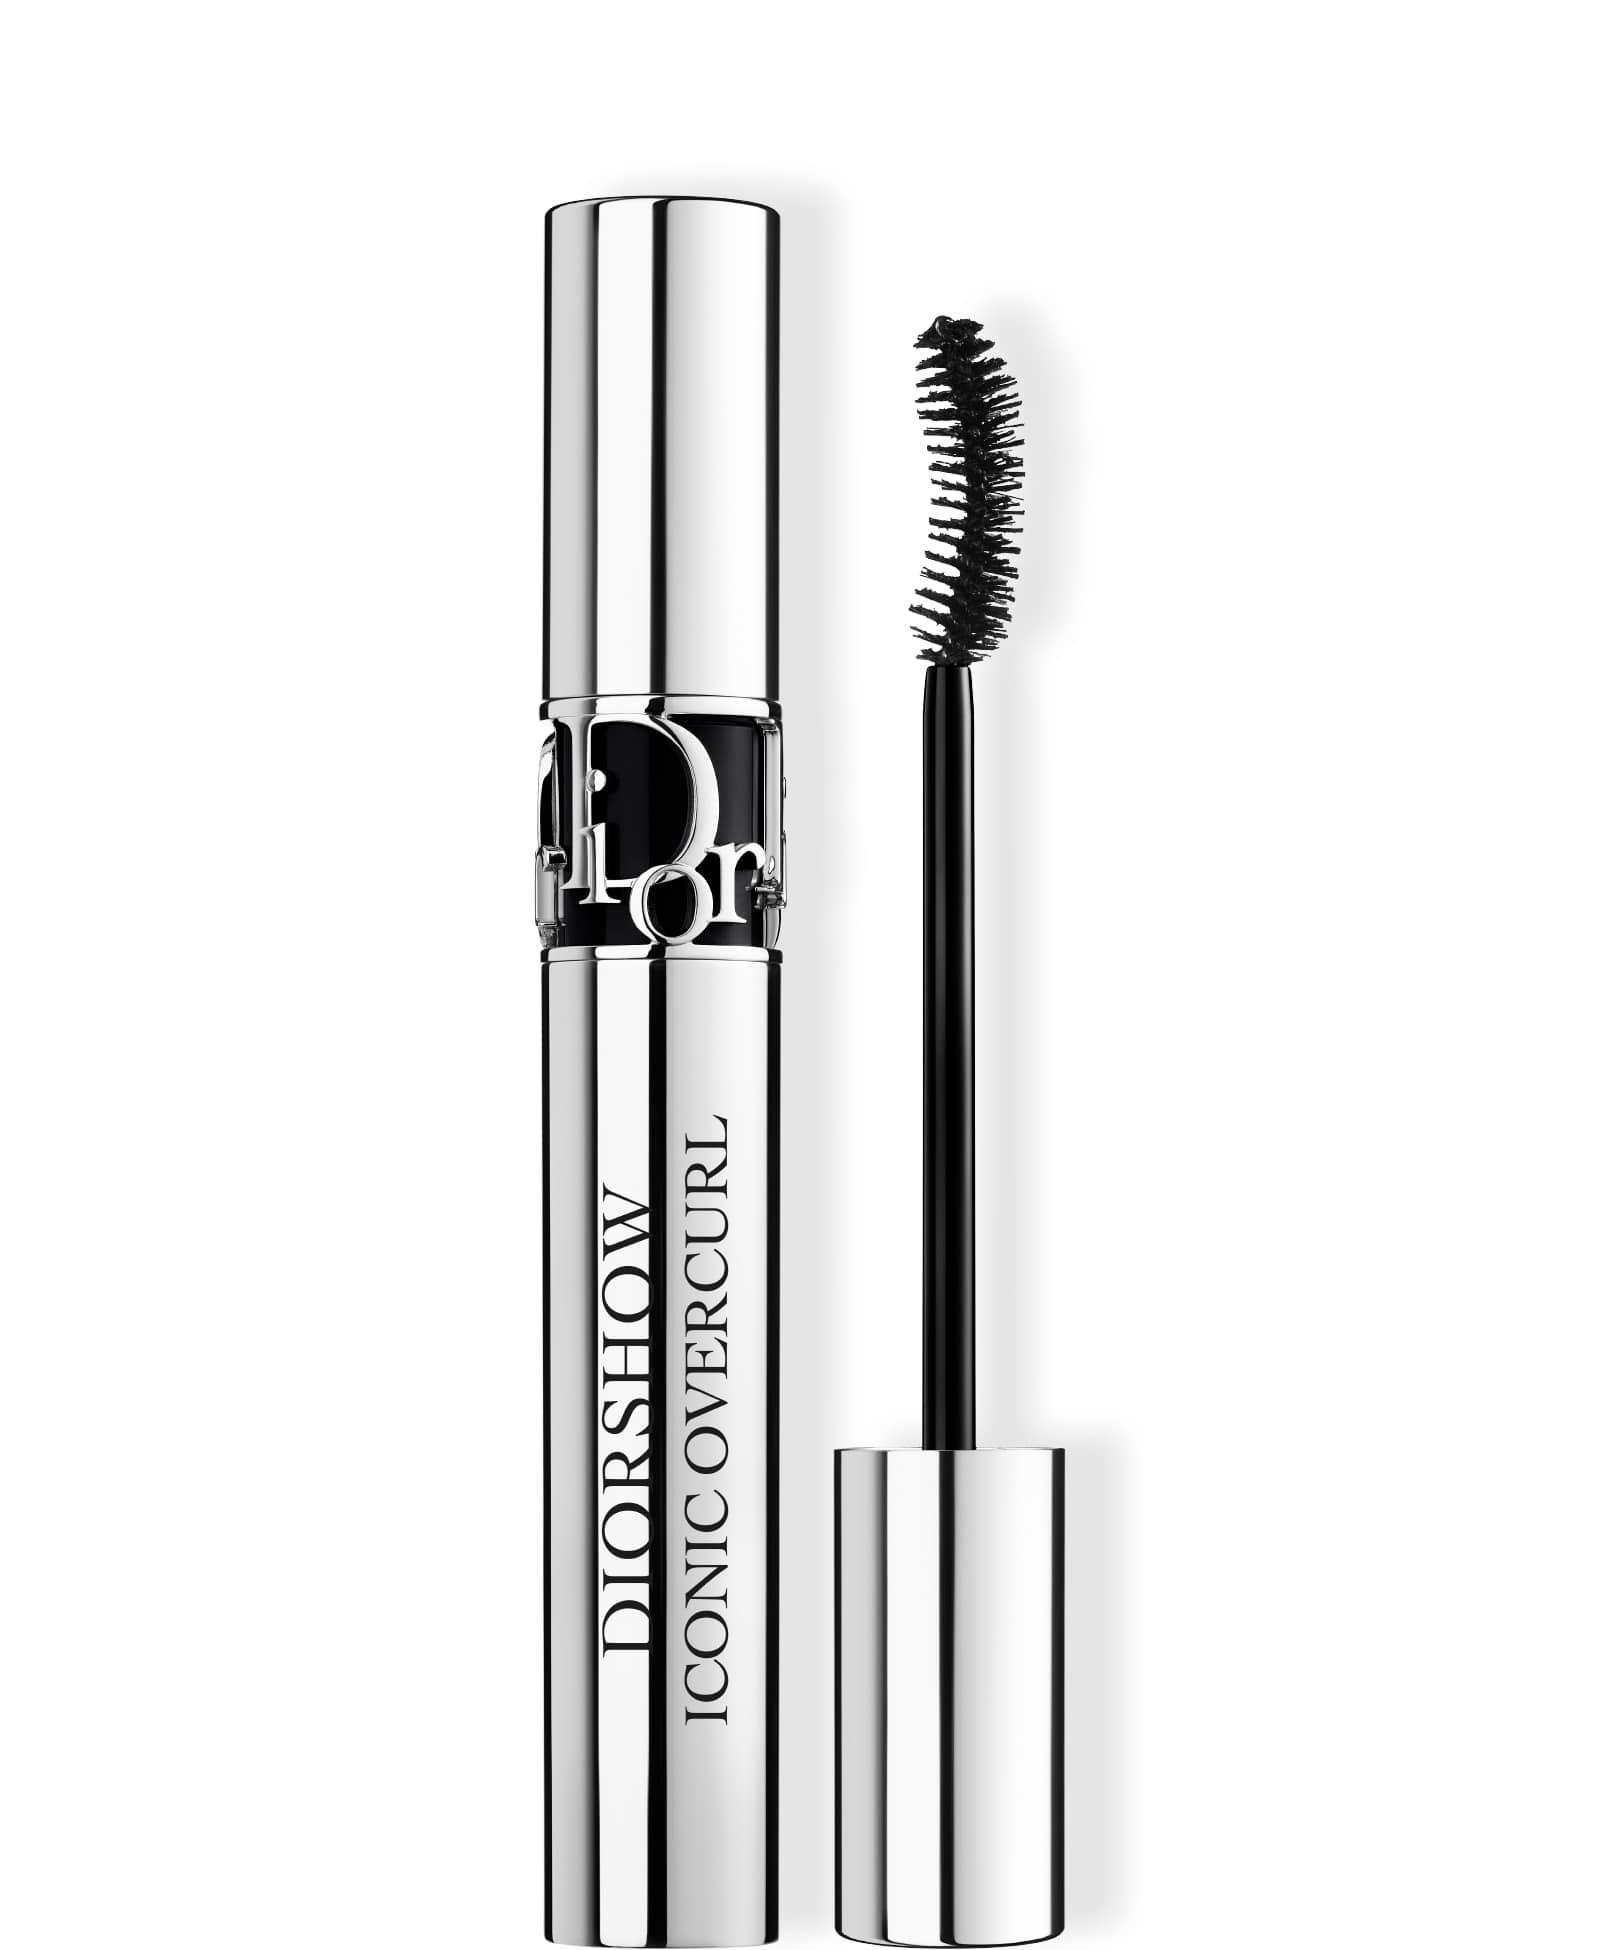 DIOR Diorshow Iconic Overcurl Mascara, 090 black